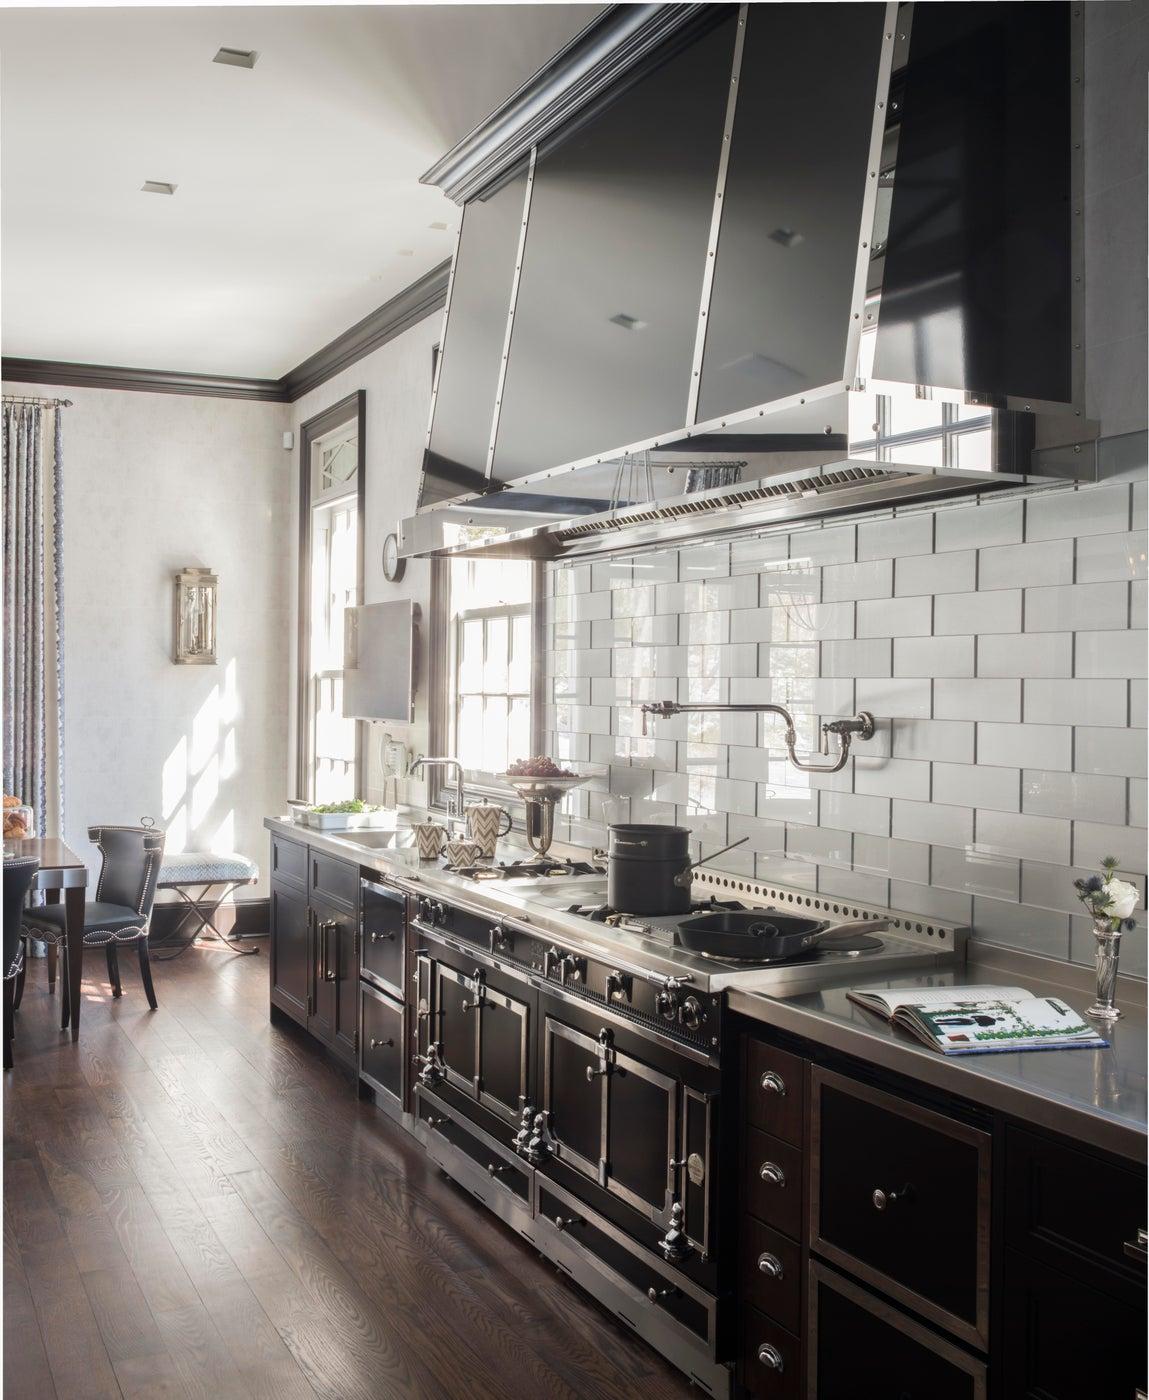 Black and White Kitchen, Greenwich